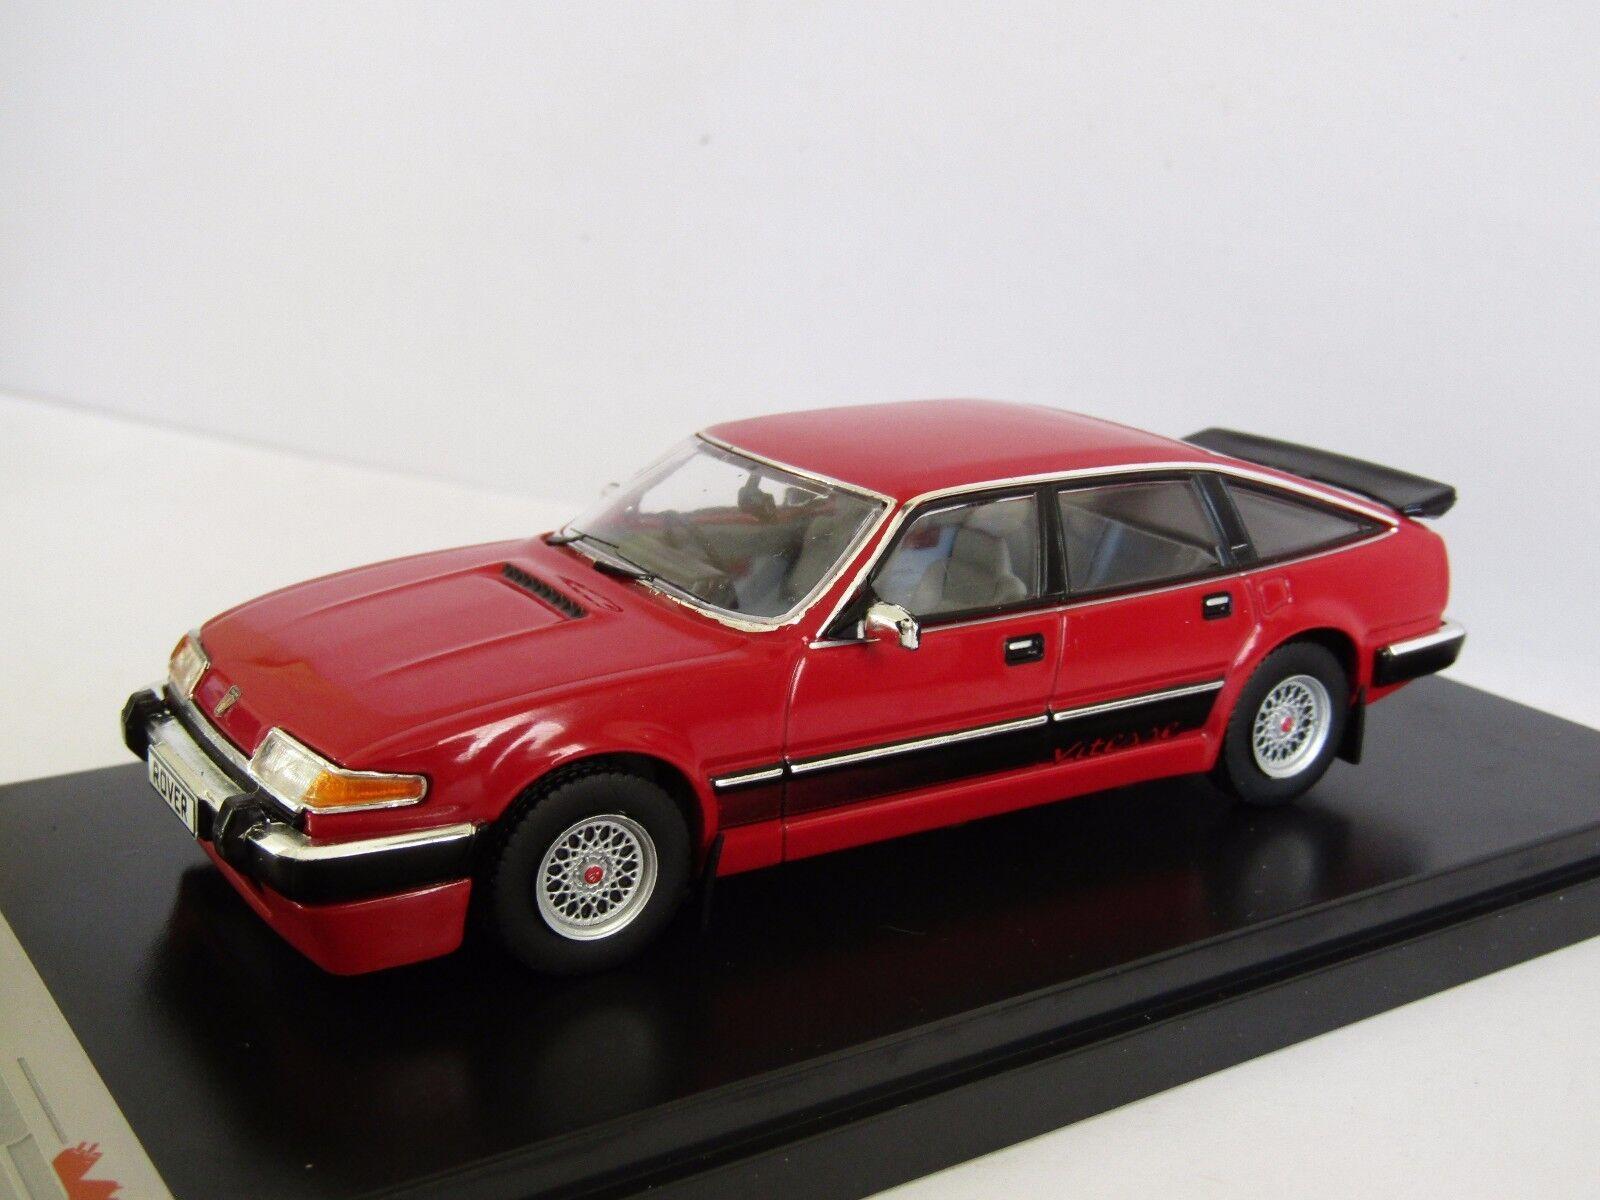 PREMIUM X (IXO) ROVER SD1 VITESSE 1980 RED 1 43 PRD085